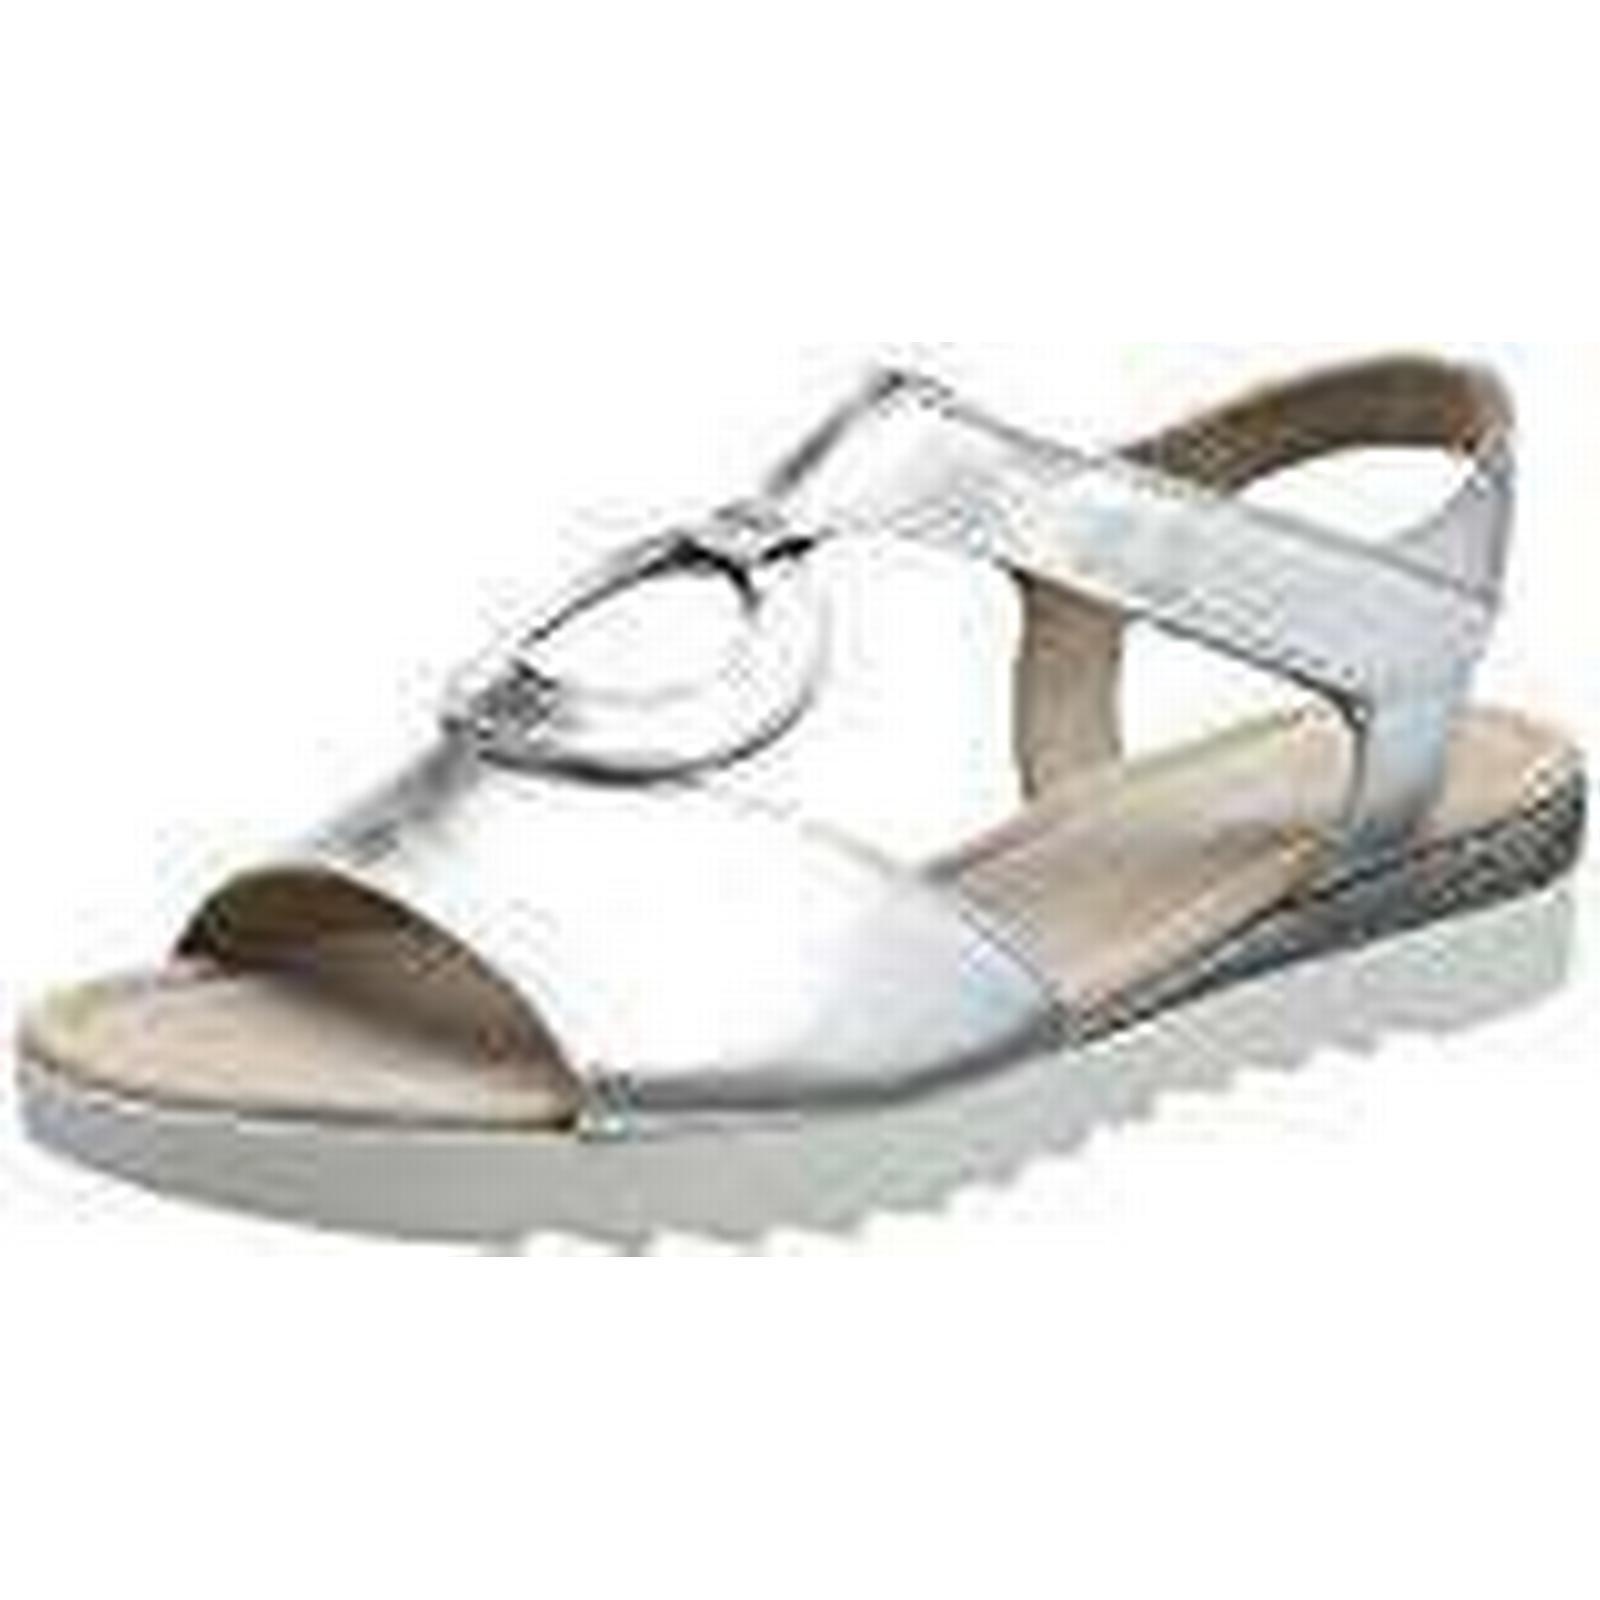 Gabor Shoes Women''s Comfort Sport (Silber Open Toe Sandals, Multicolor (Silber Sport Glamour), 3.5 UK 3.5 UK 52ee66